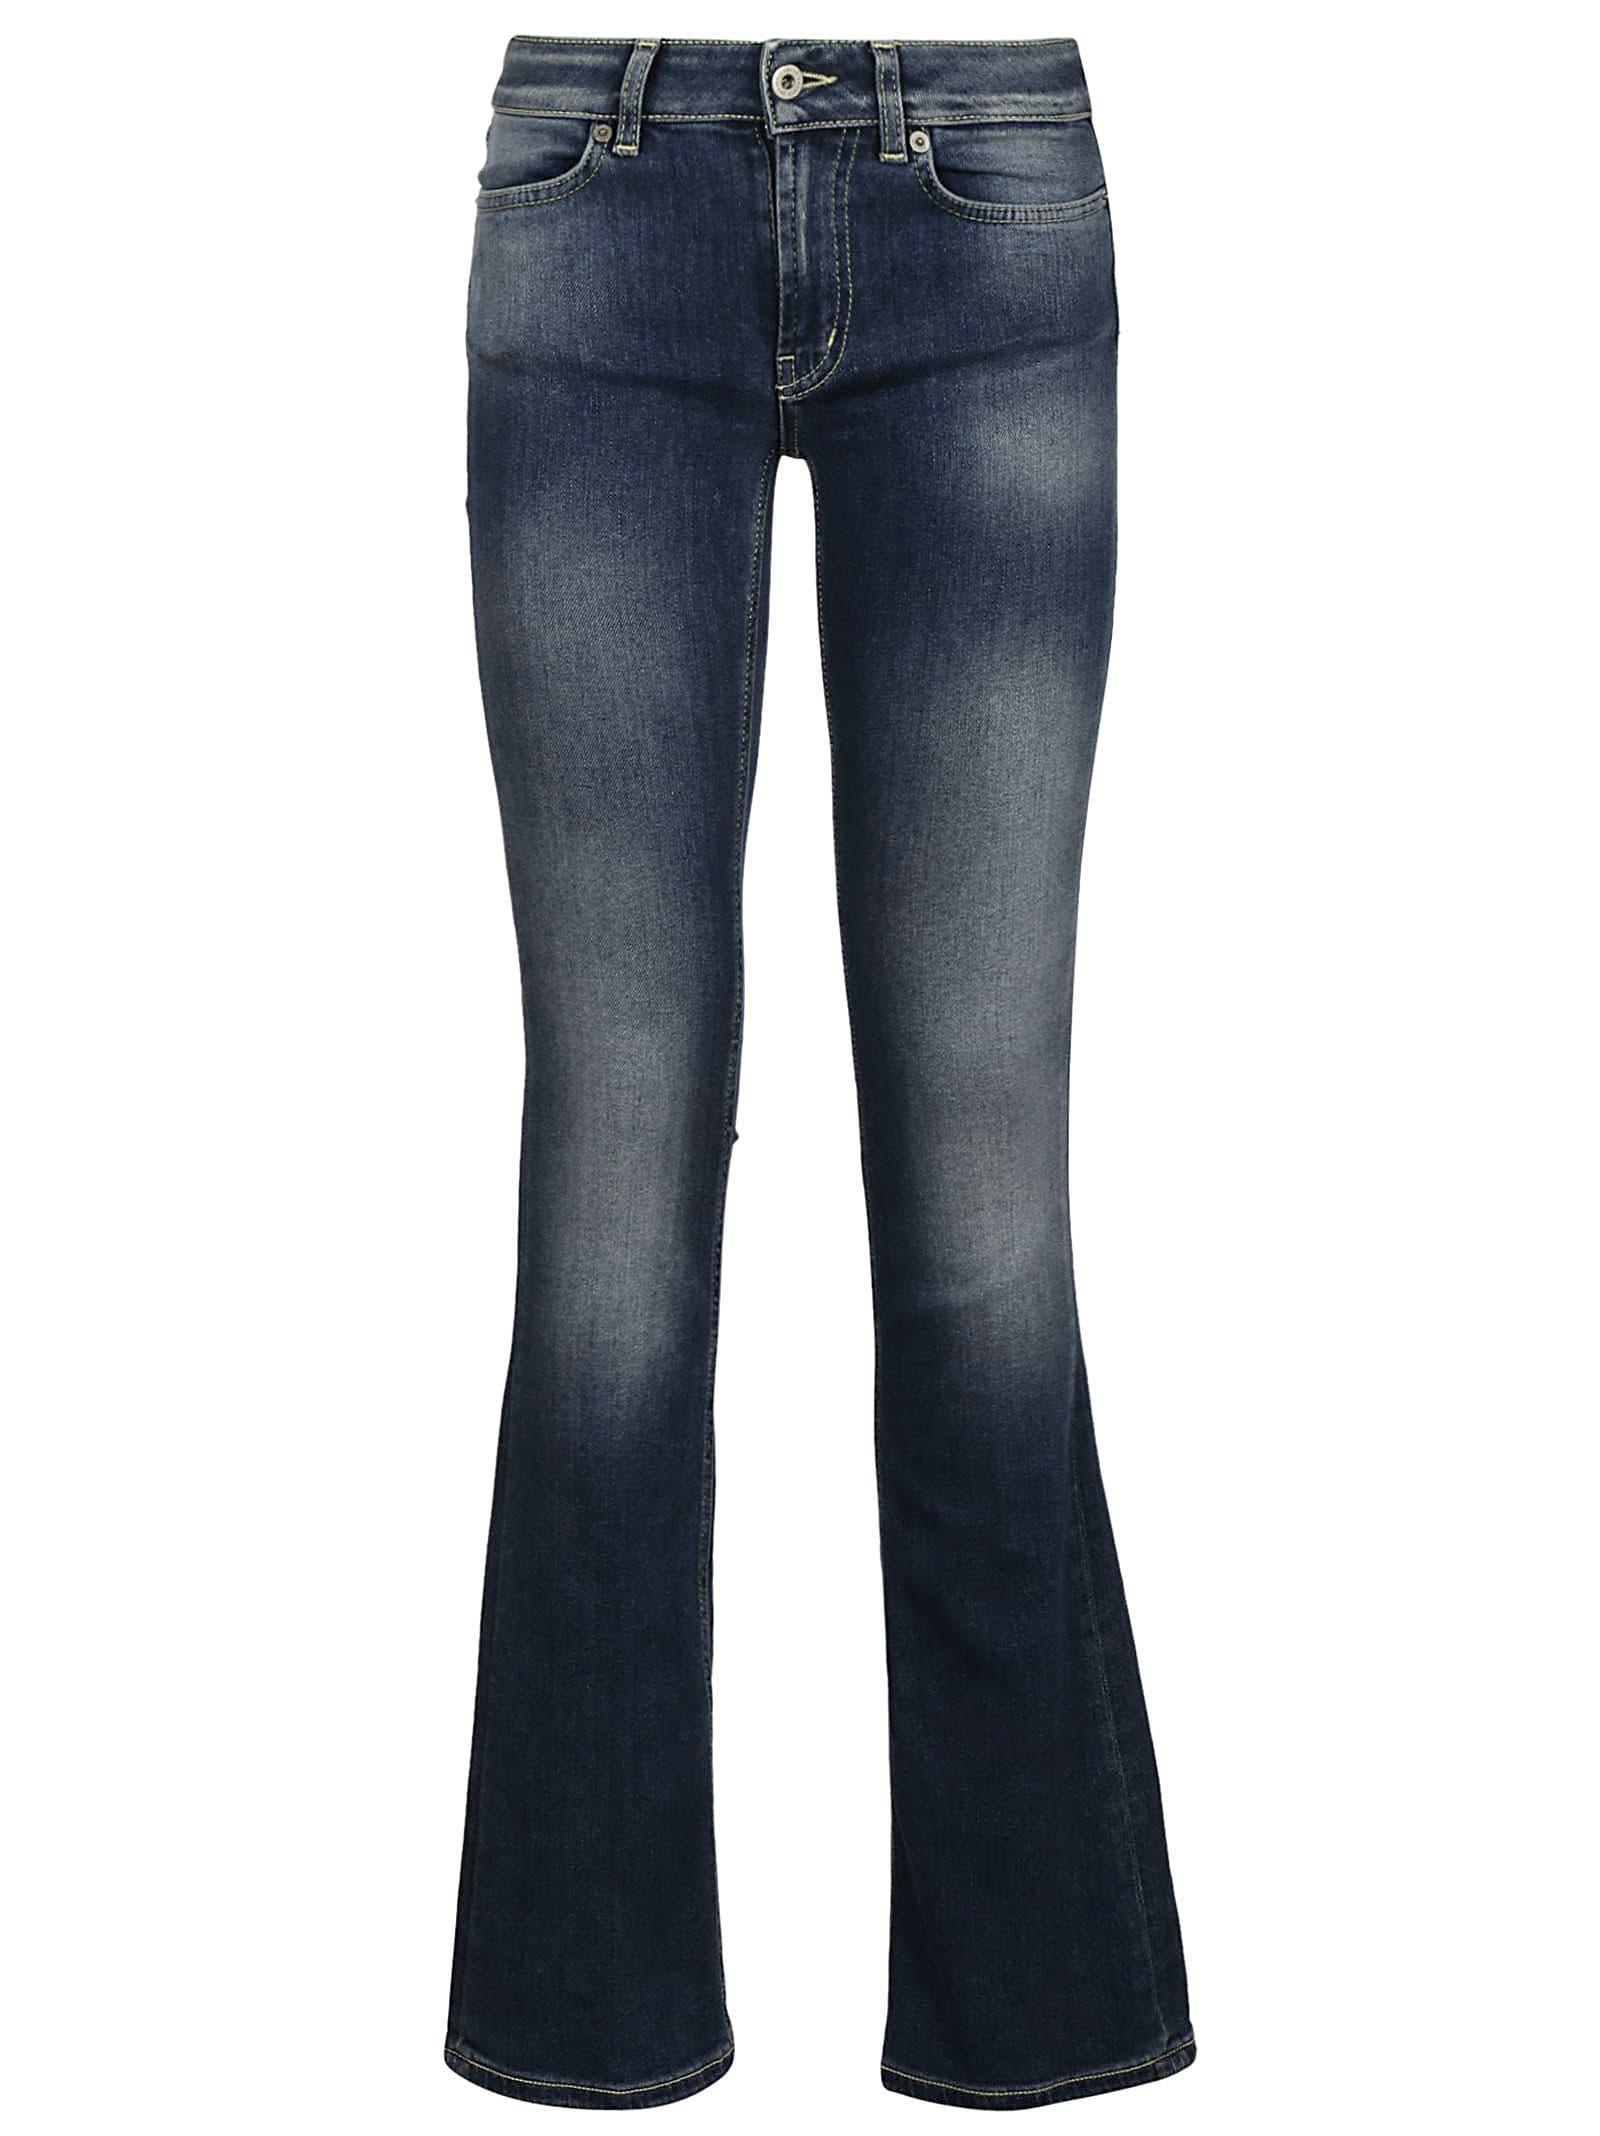 Dondup Flared Leg Long Jeans